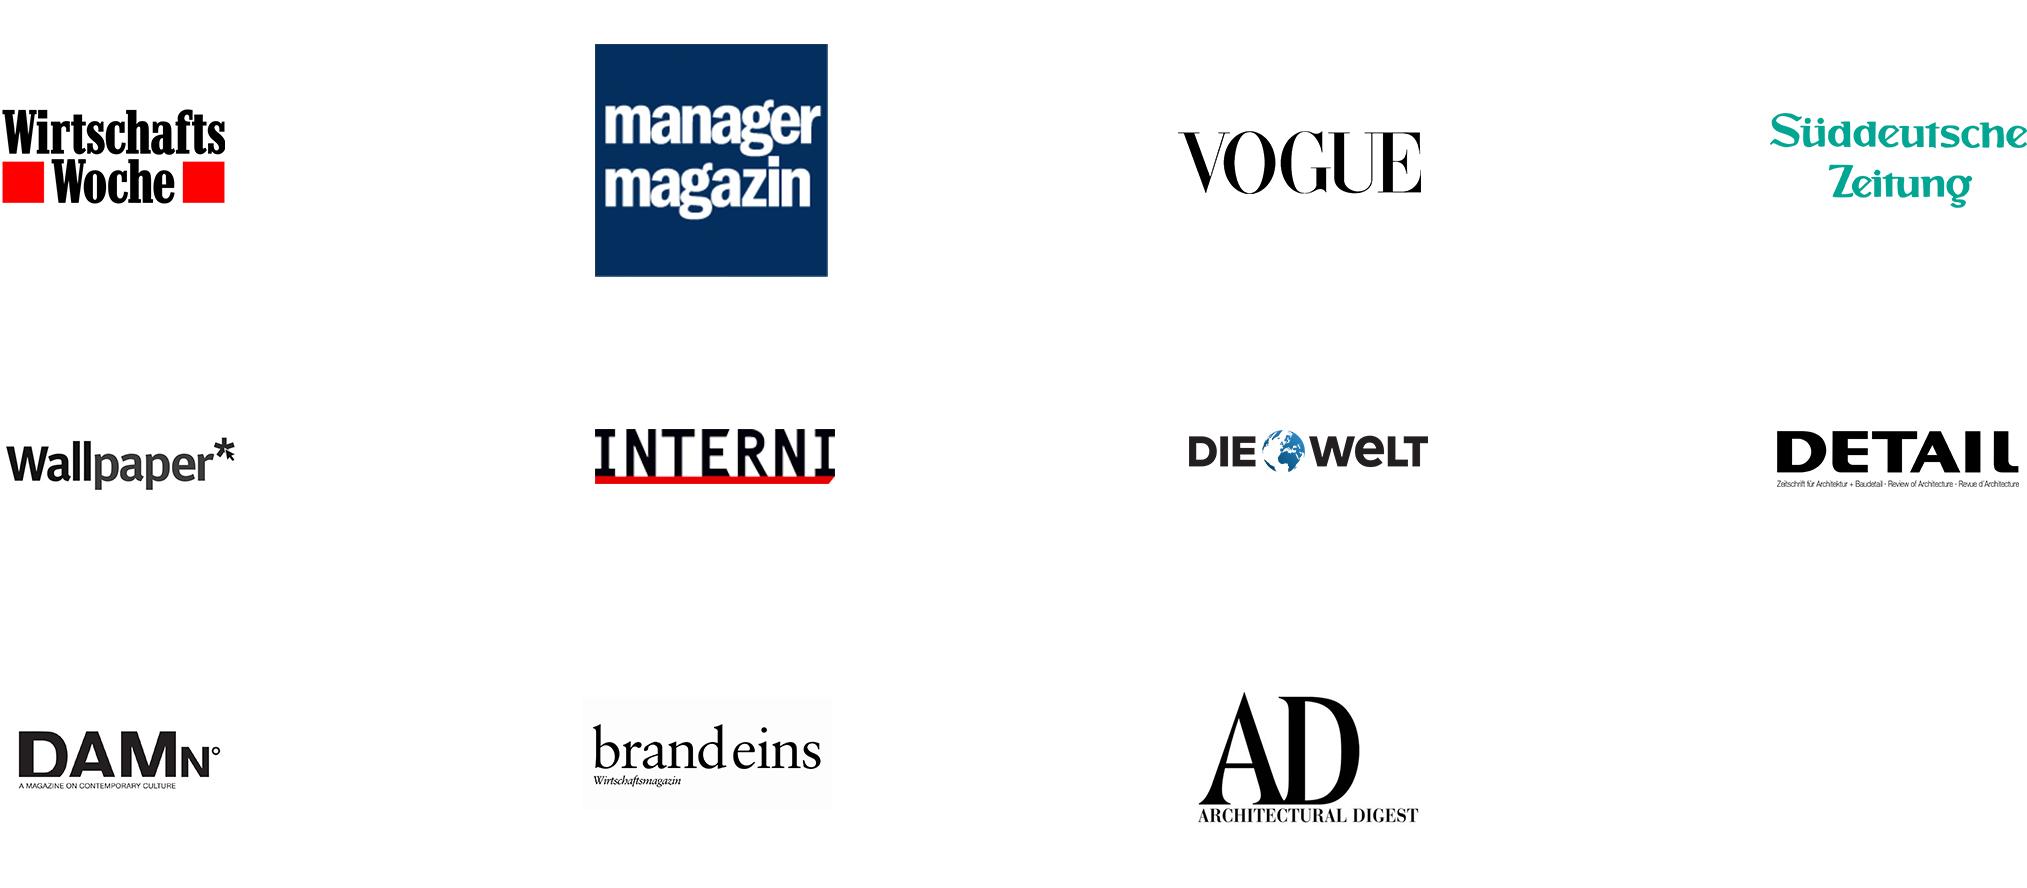 apriori pr International PR and Digital Marketing